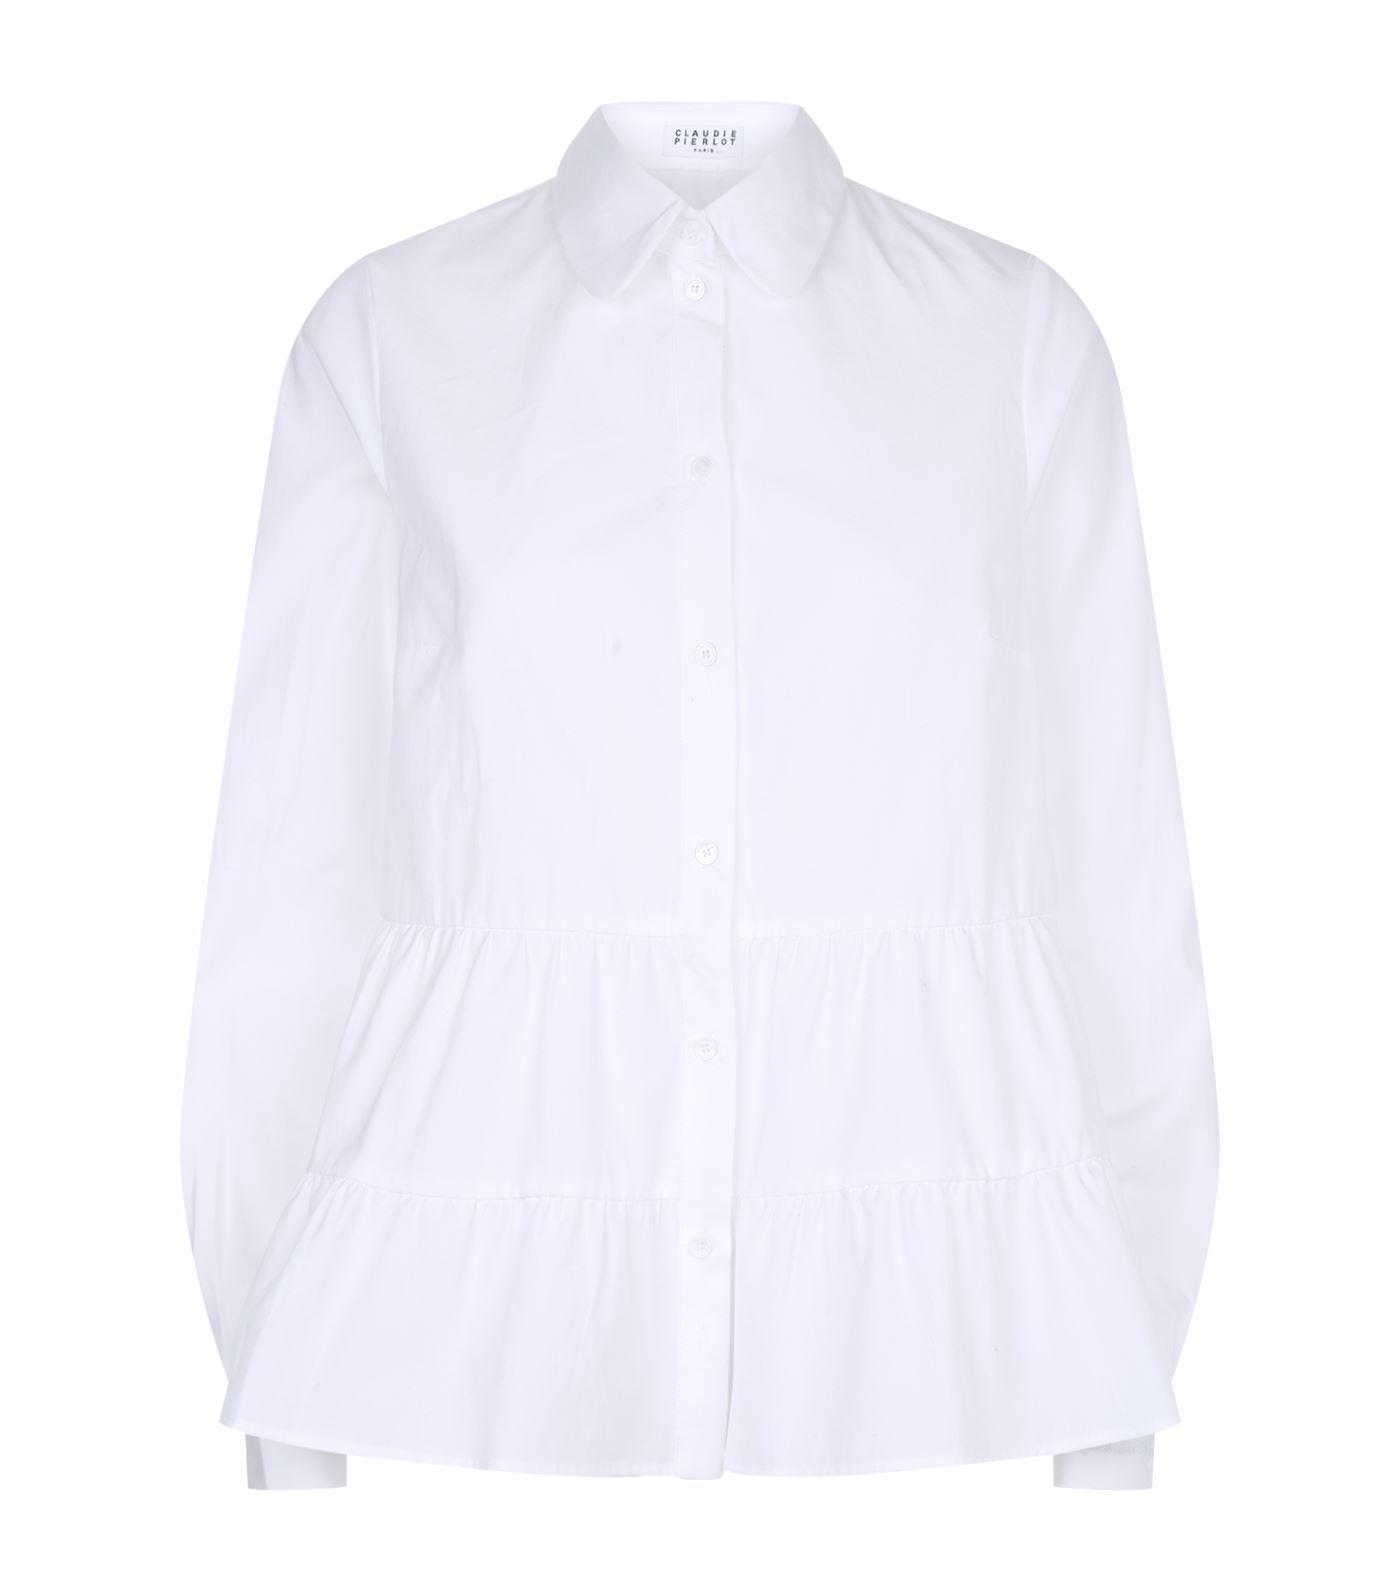 Claudie Pierlot Woman Ruffle-trimmed Knitted Top Pastel Pink Size 2 Claudie Pierlot Cheap Sale Inexpensive 2018 Online Sale Lowest Price Sale Online Store fKaFmQTT